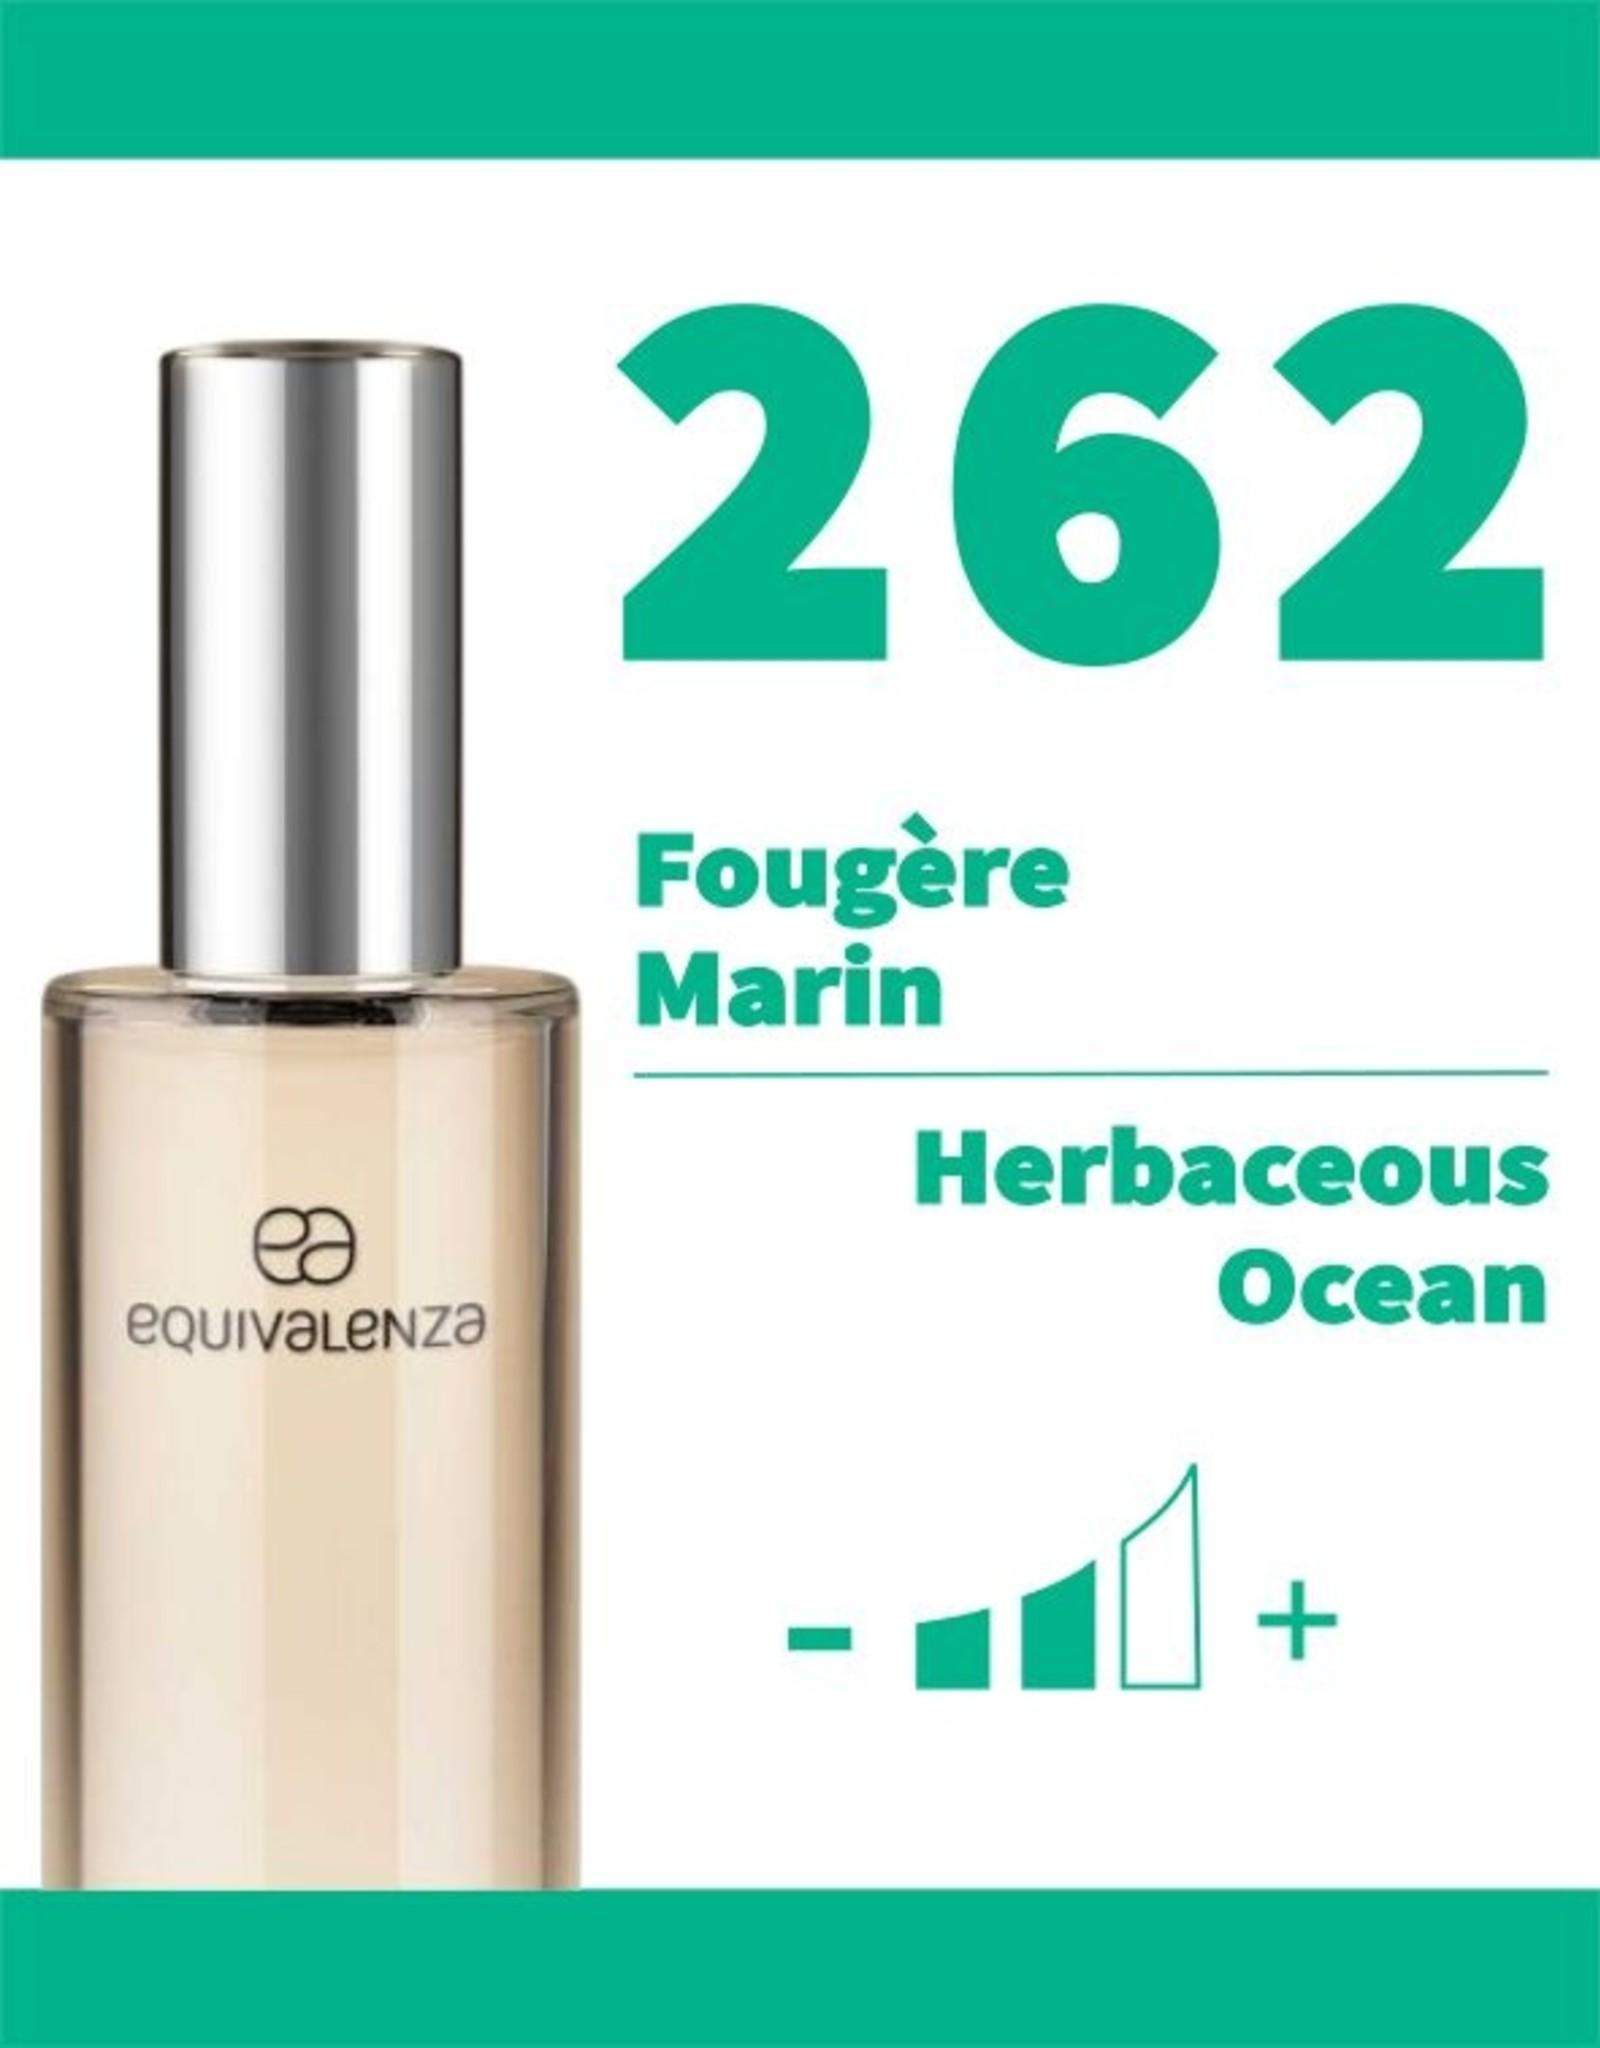 Equivalenza Fougère Marin 262